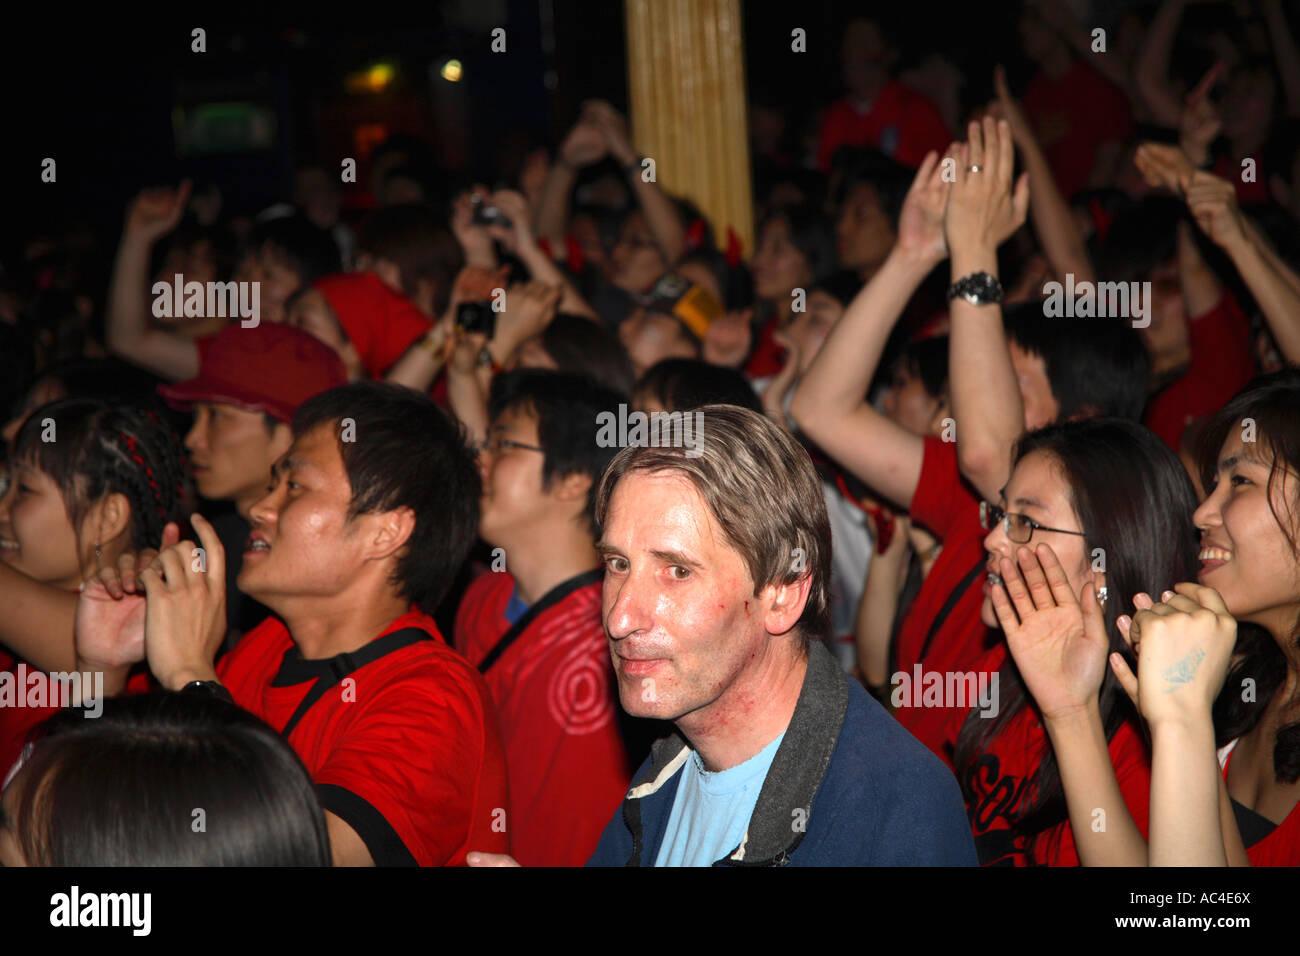 western guy sitting amongst south korean republic fans watching